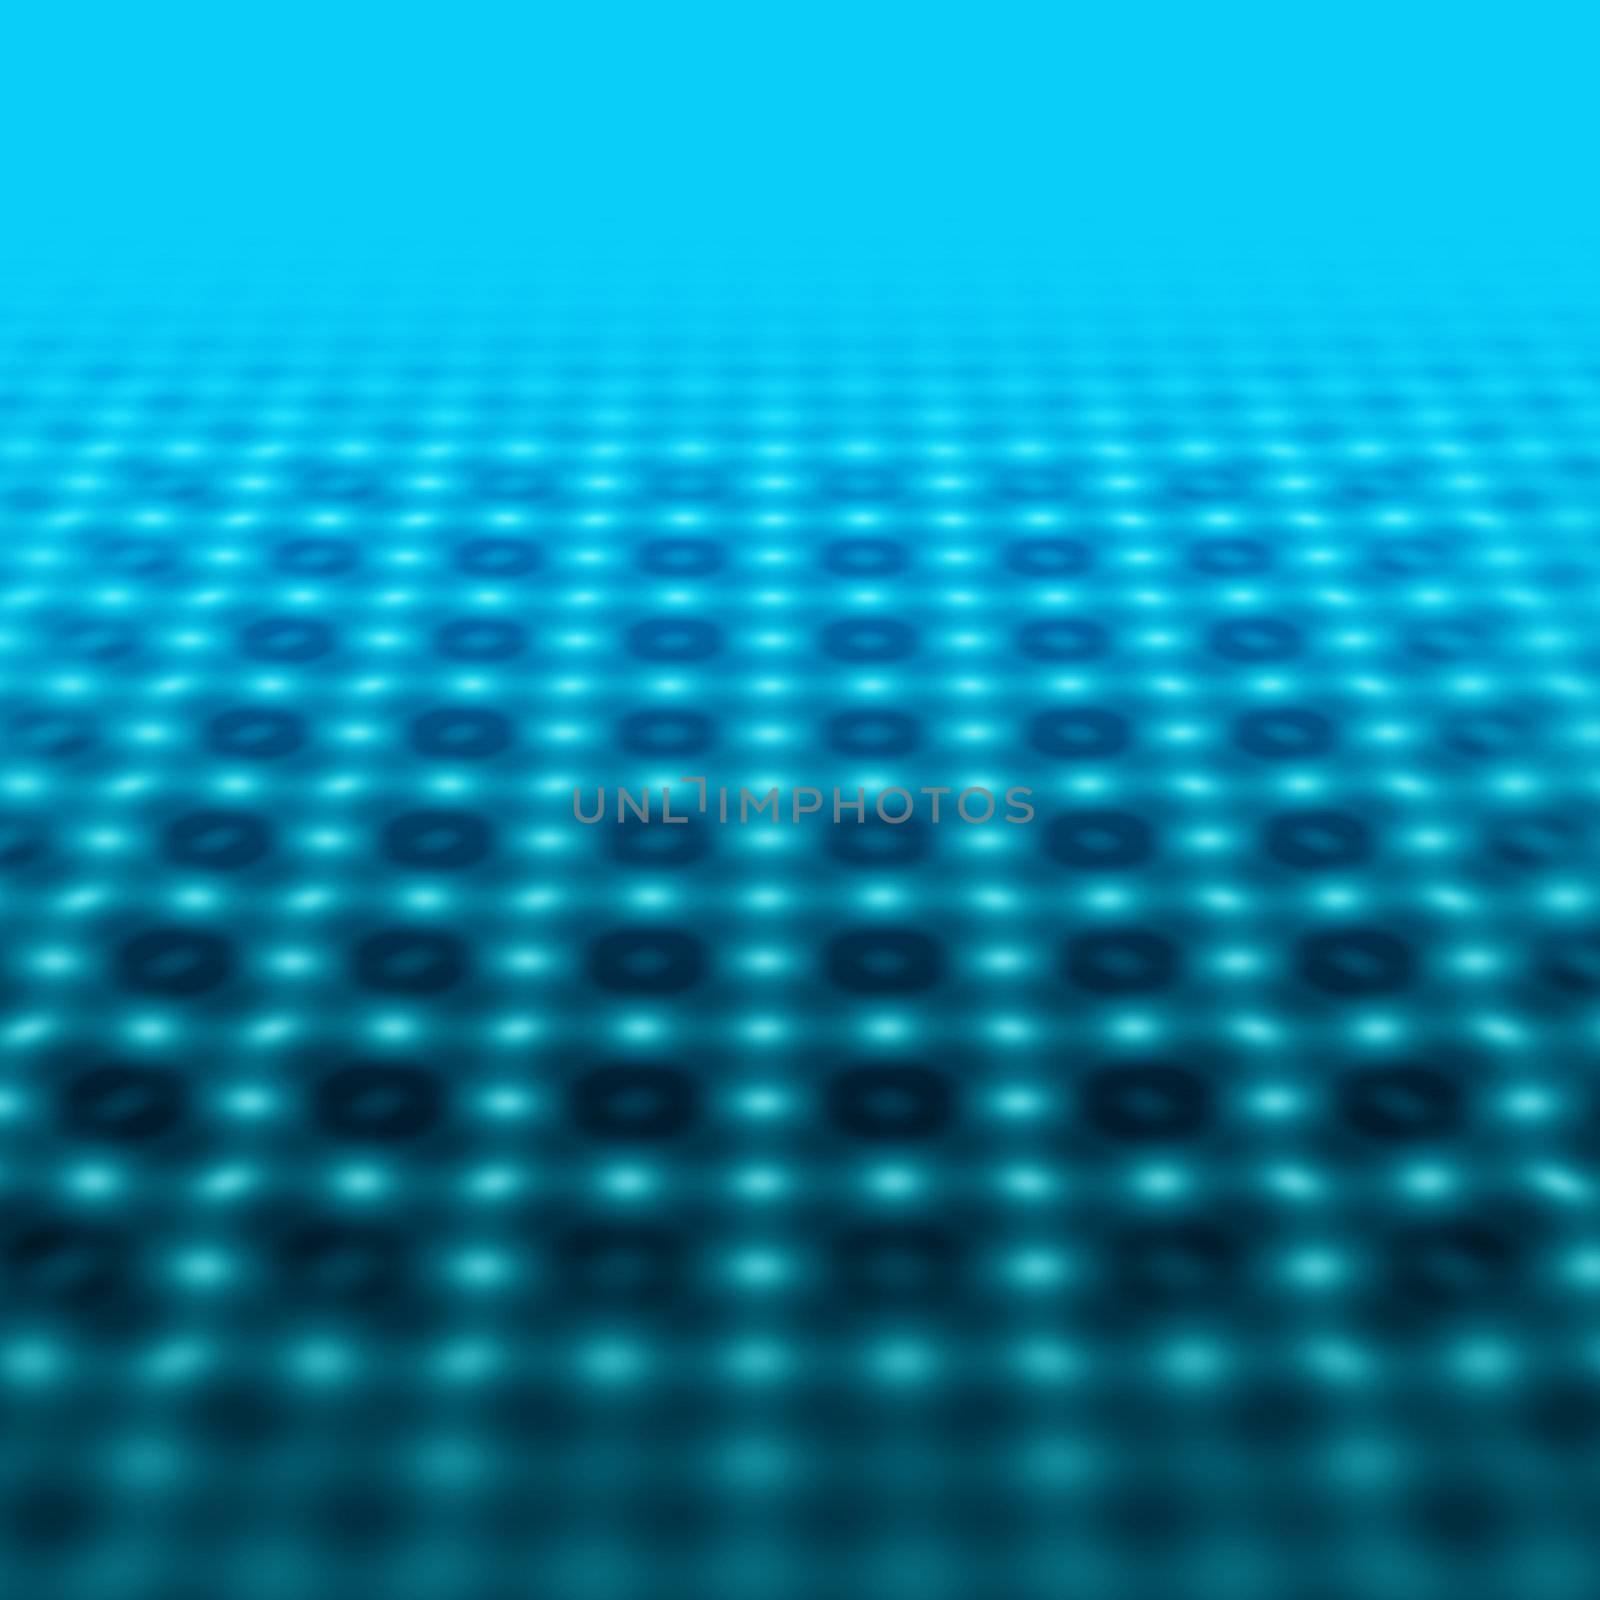 disco dance floor abstract blue background